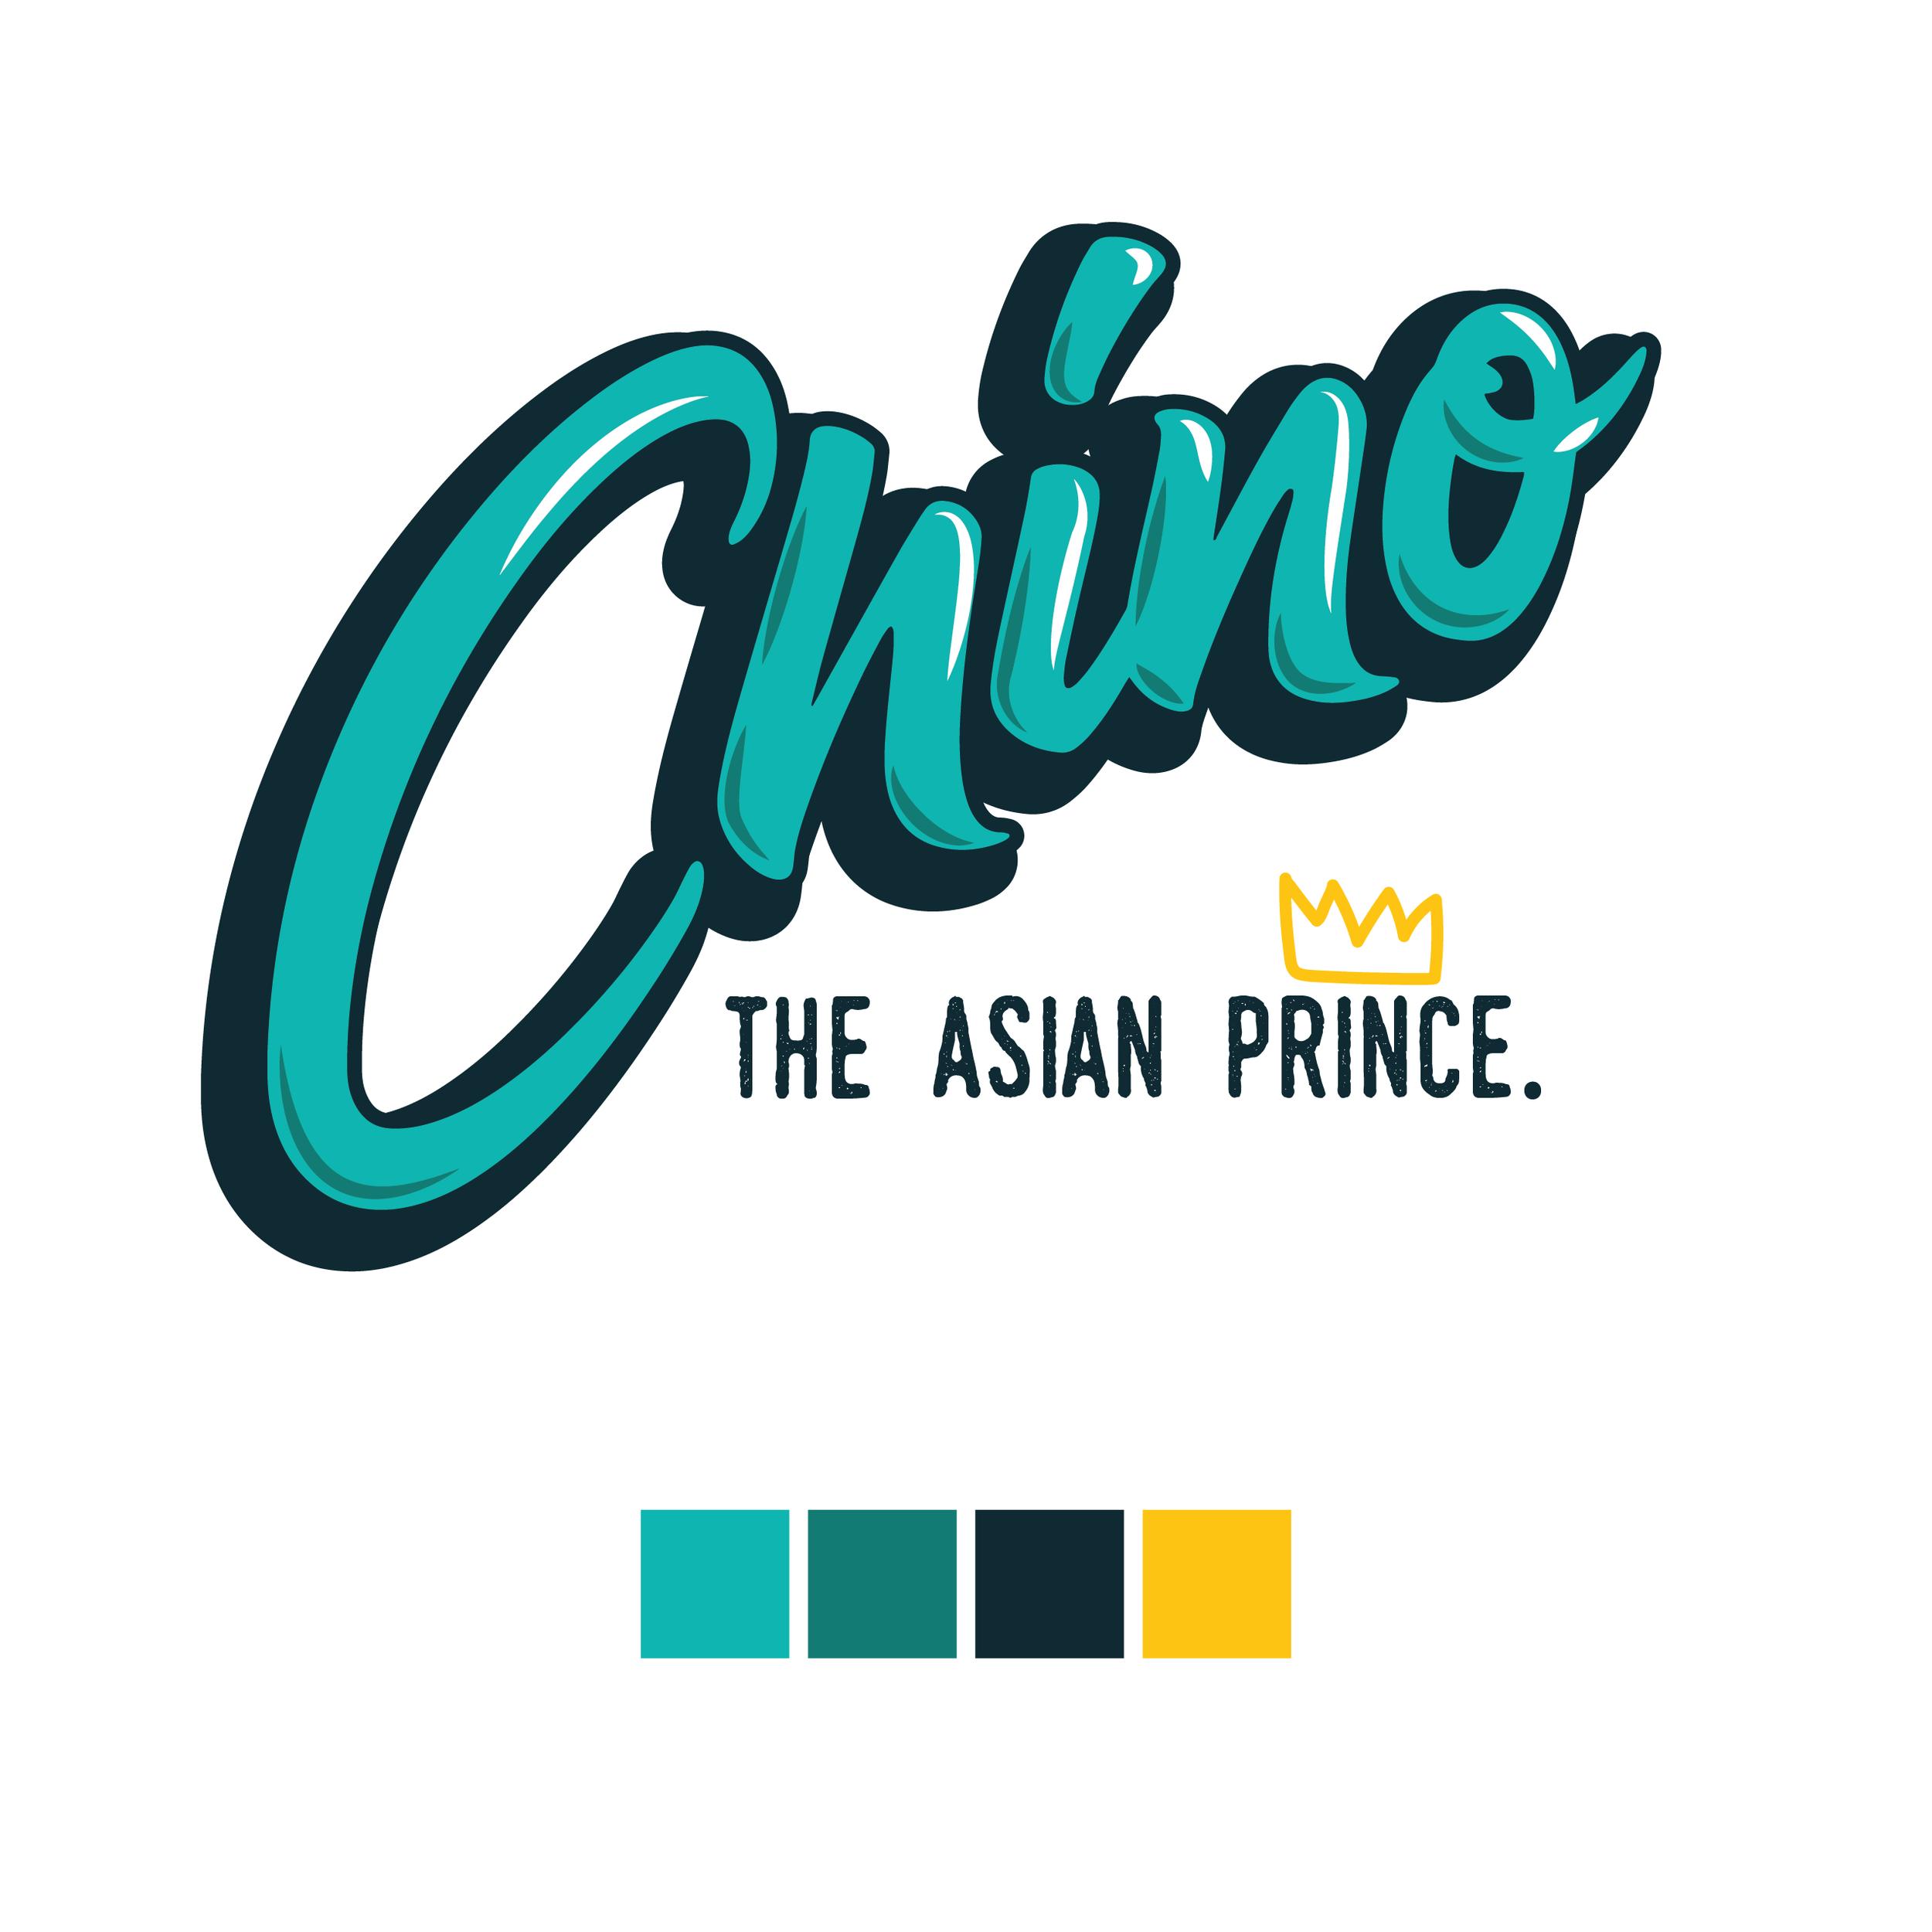 2018 Logo Design: Chino